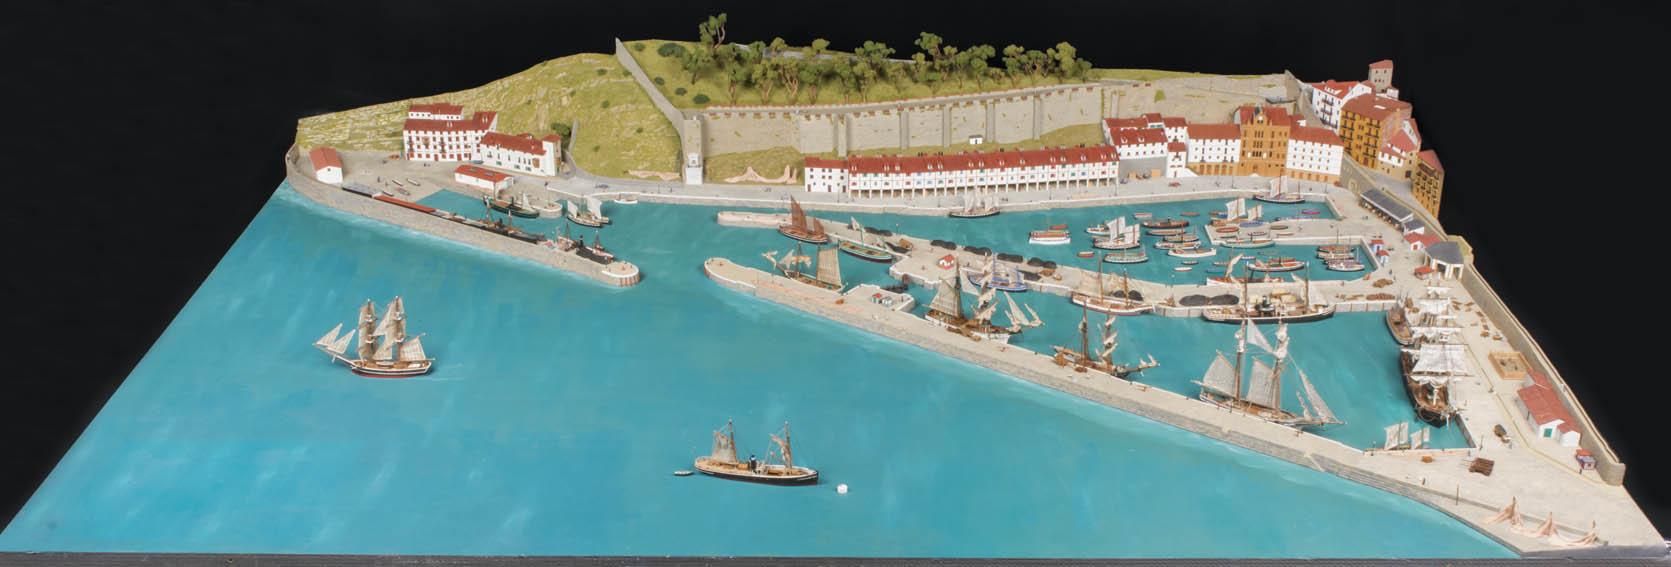 Diorama que recrea fielmente el puerto de San Sebastián, pudiéndose apreciar numerosos detalles constructivos del mismo a finales del siglo XIX.